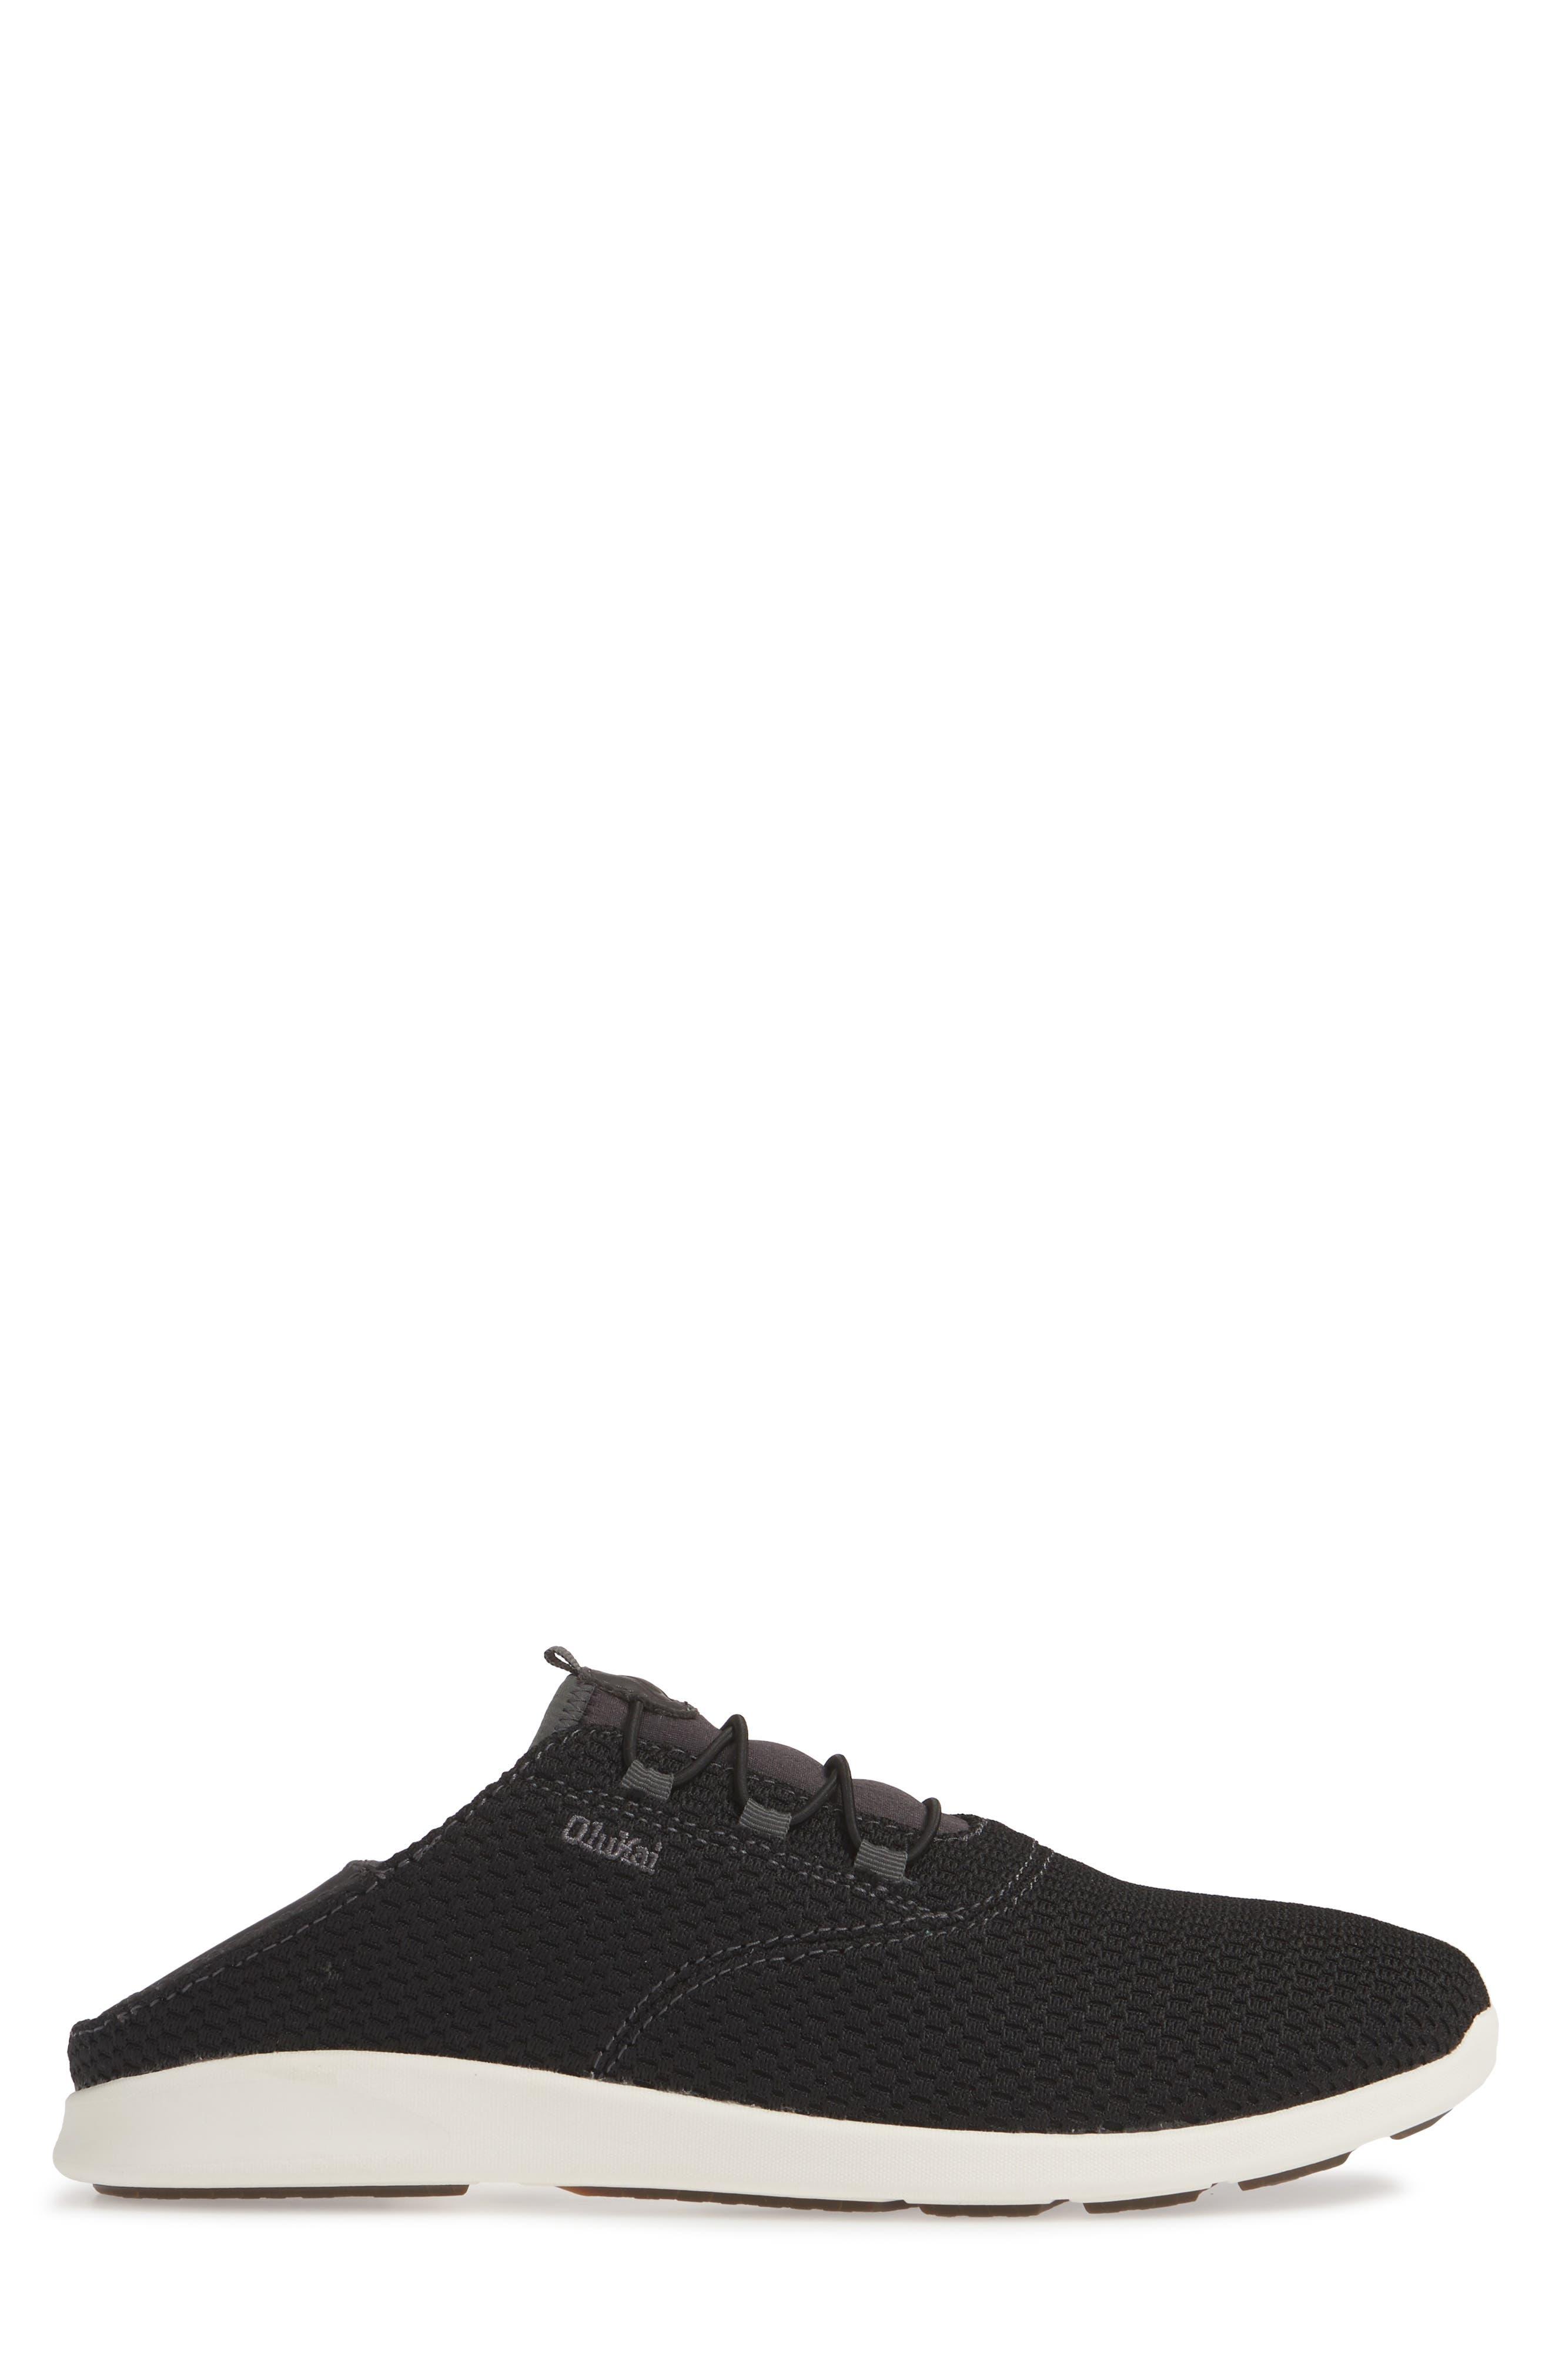 OLUKAI, Alapa Li Sneaker, Alternate thumbnail 4, color, BLACK/ DARK SHADOW MESH